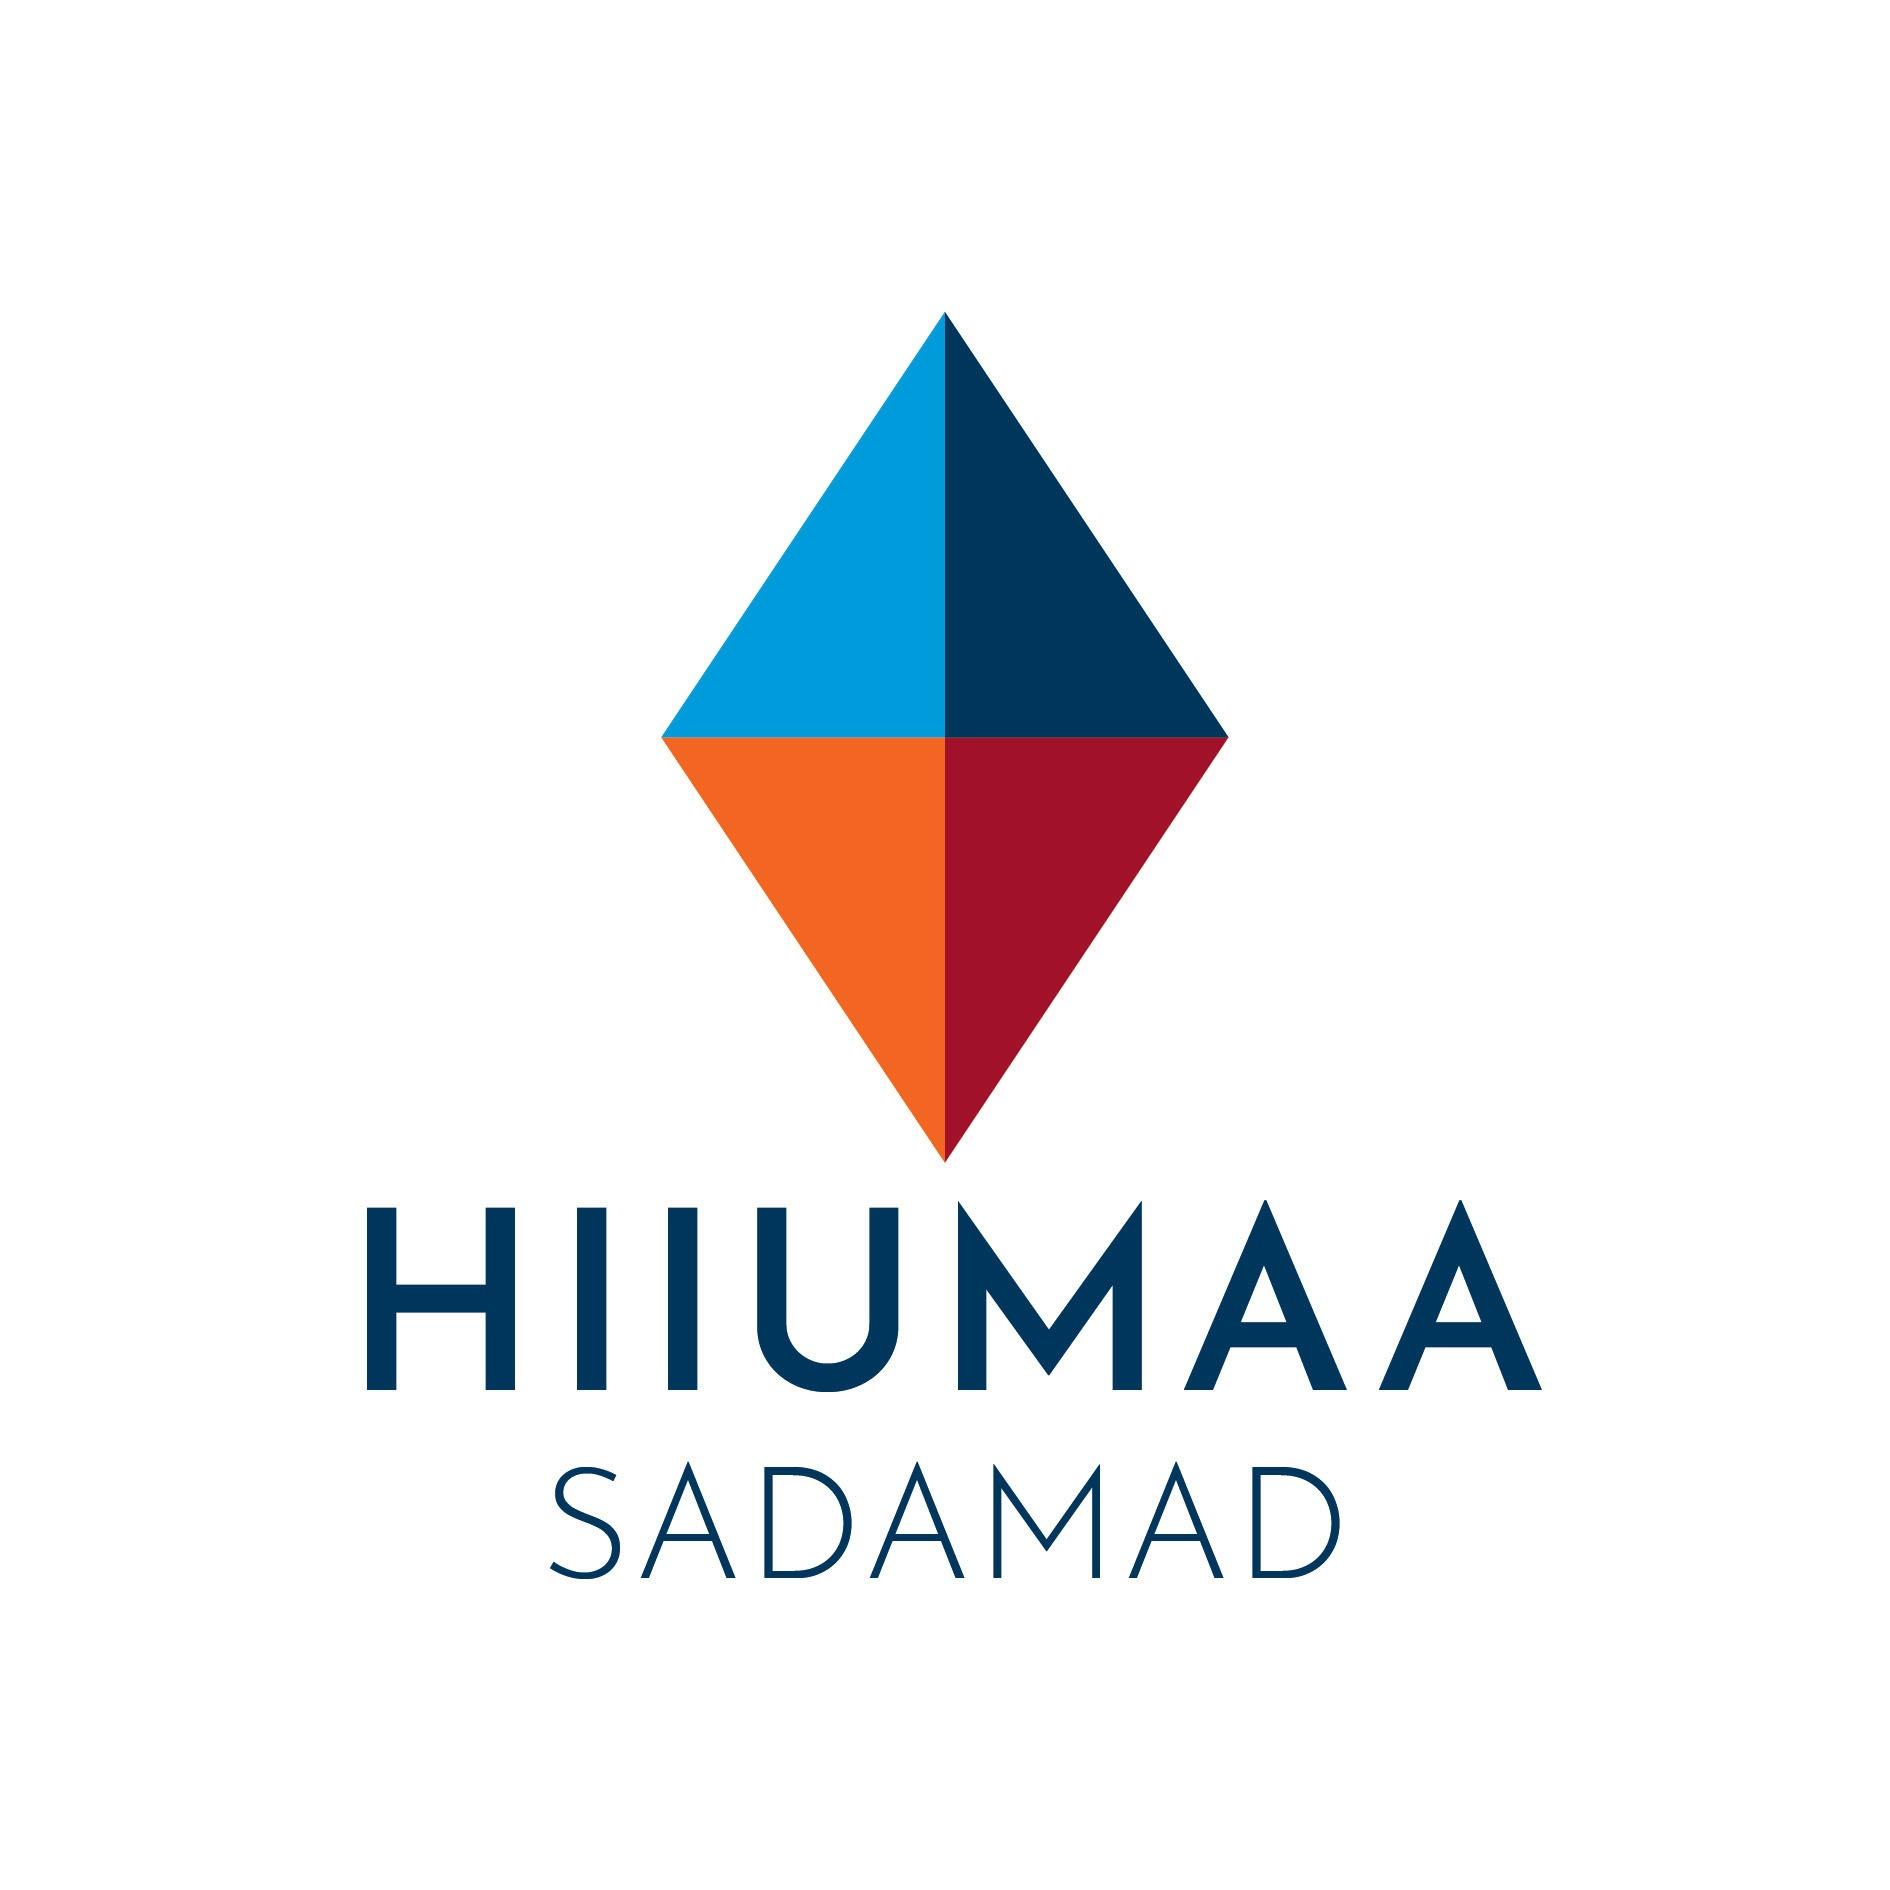 Kärdla sadam logo